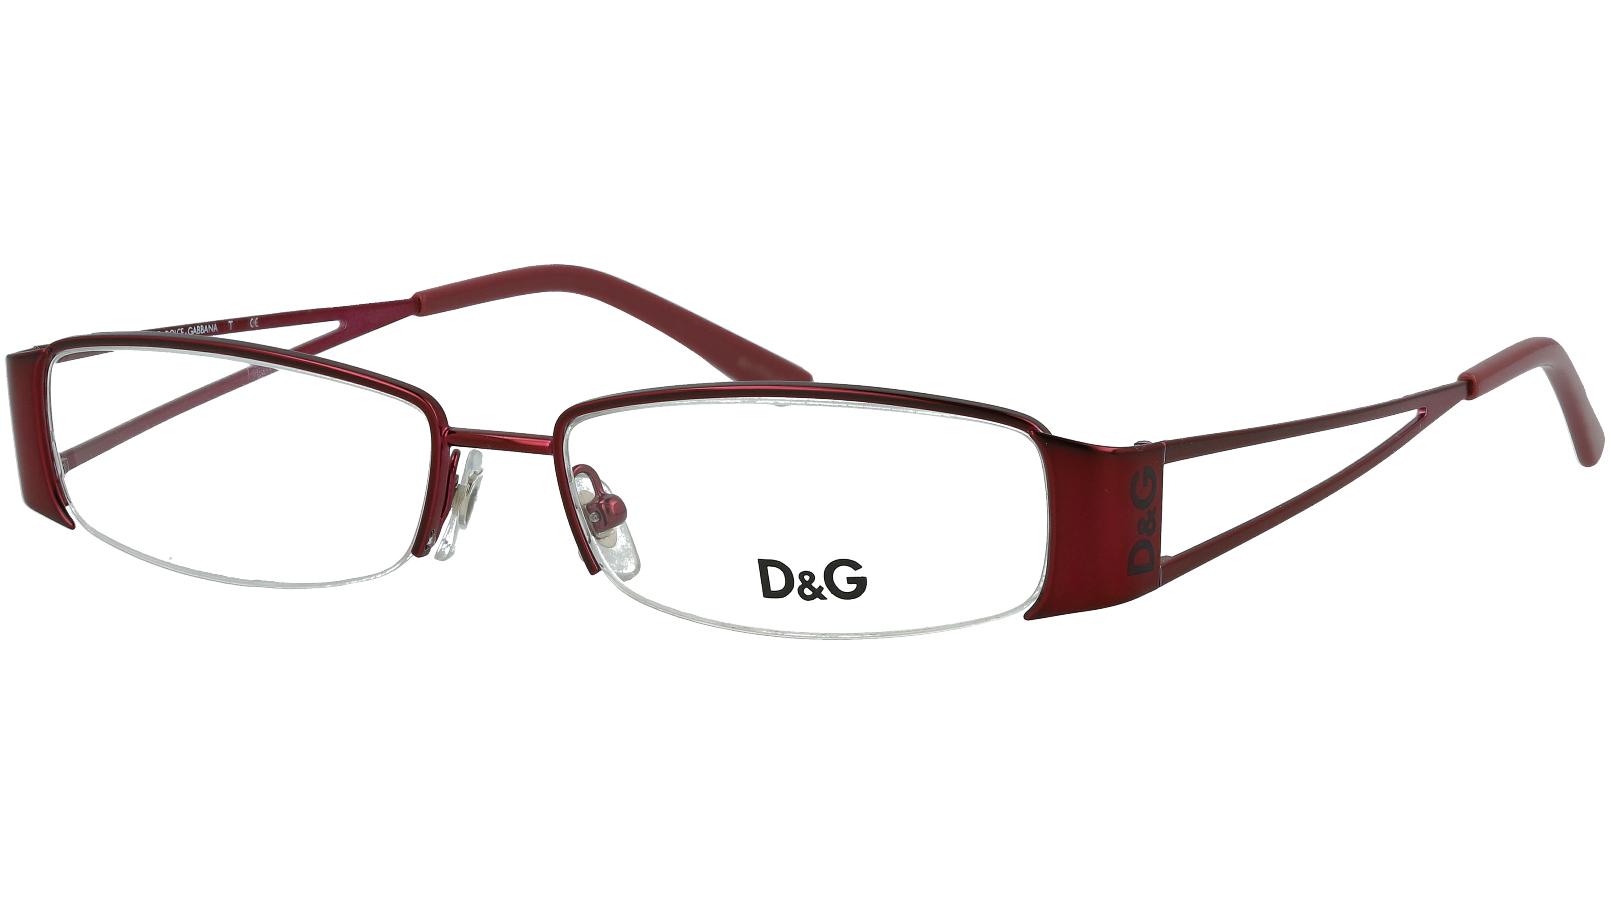 Dolce&Gabbana DG5027 075 50 RED Glasses